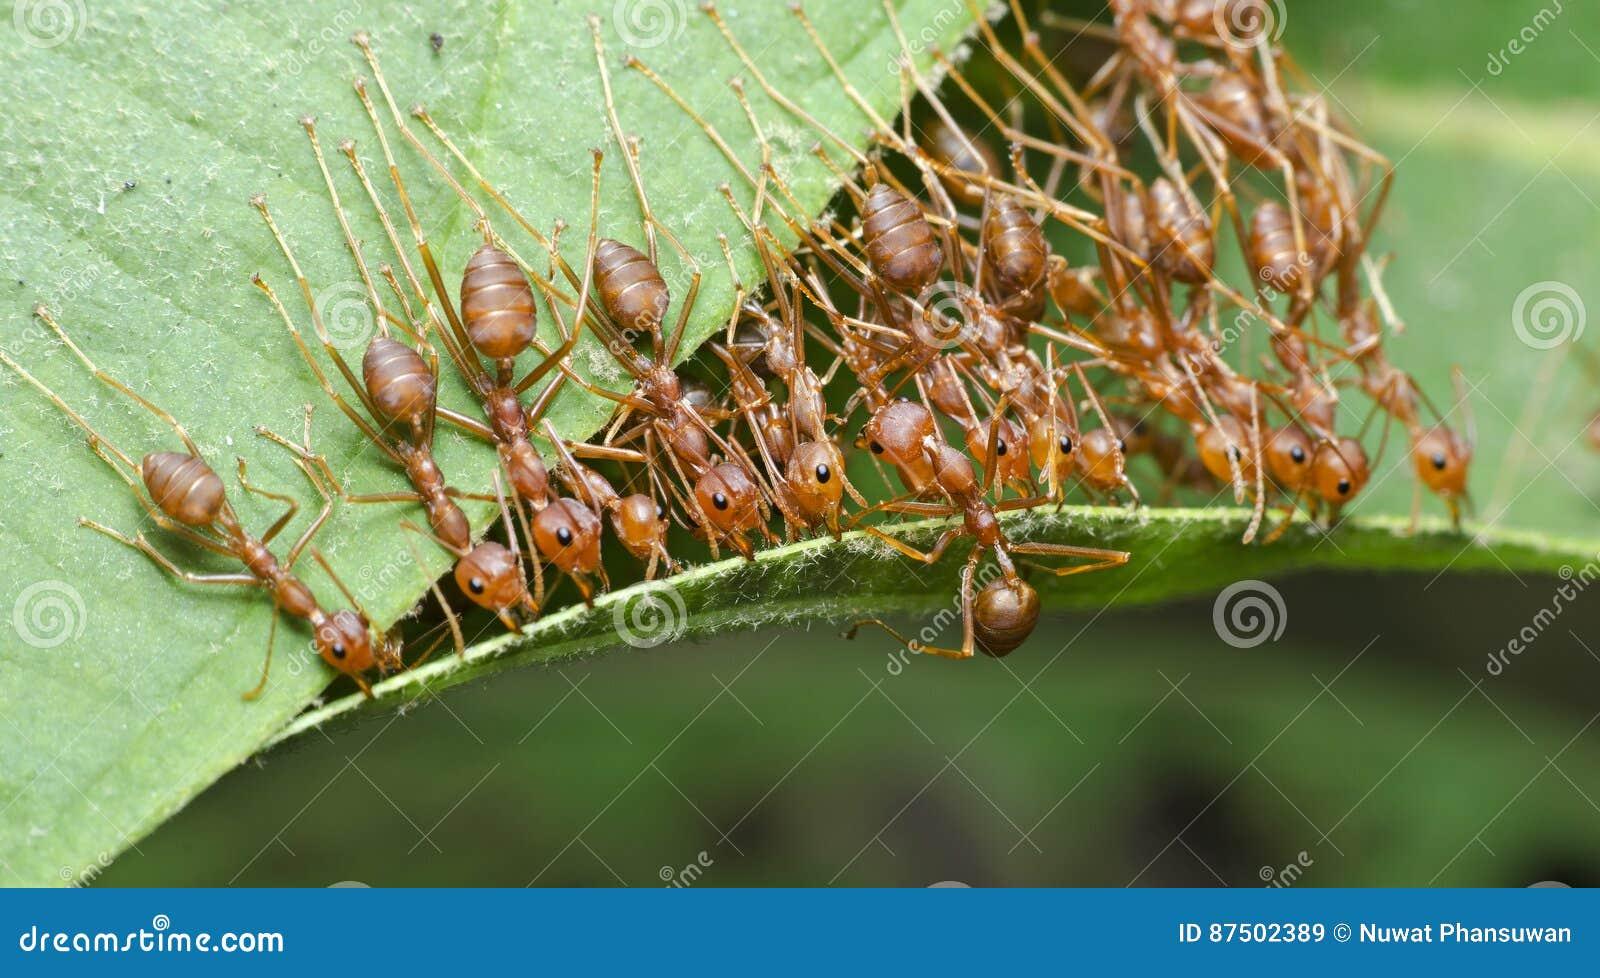 Formiga, formiga vermelha